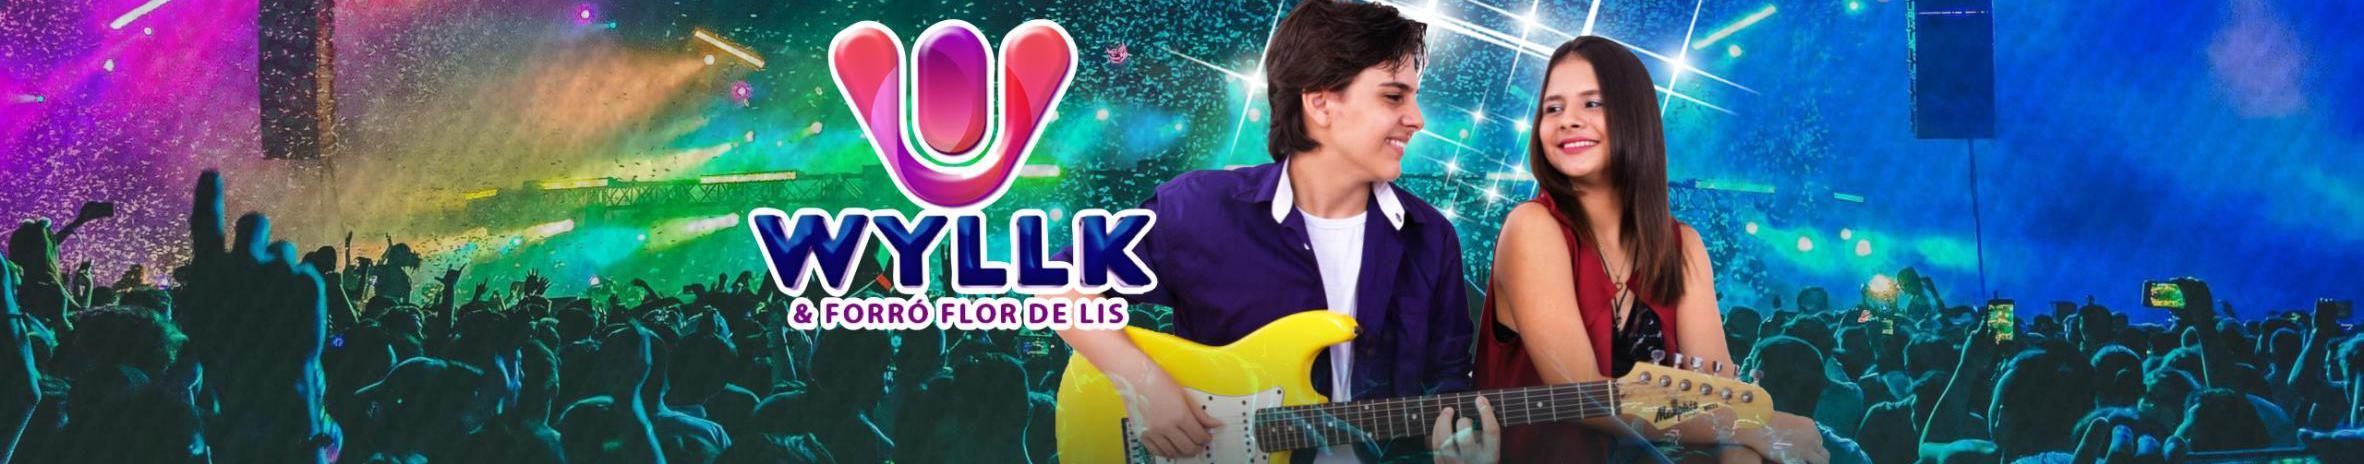 Imagem de capa de Wyllk e Forró Flor de Lis